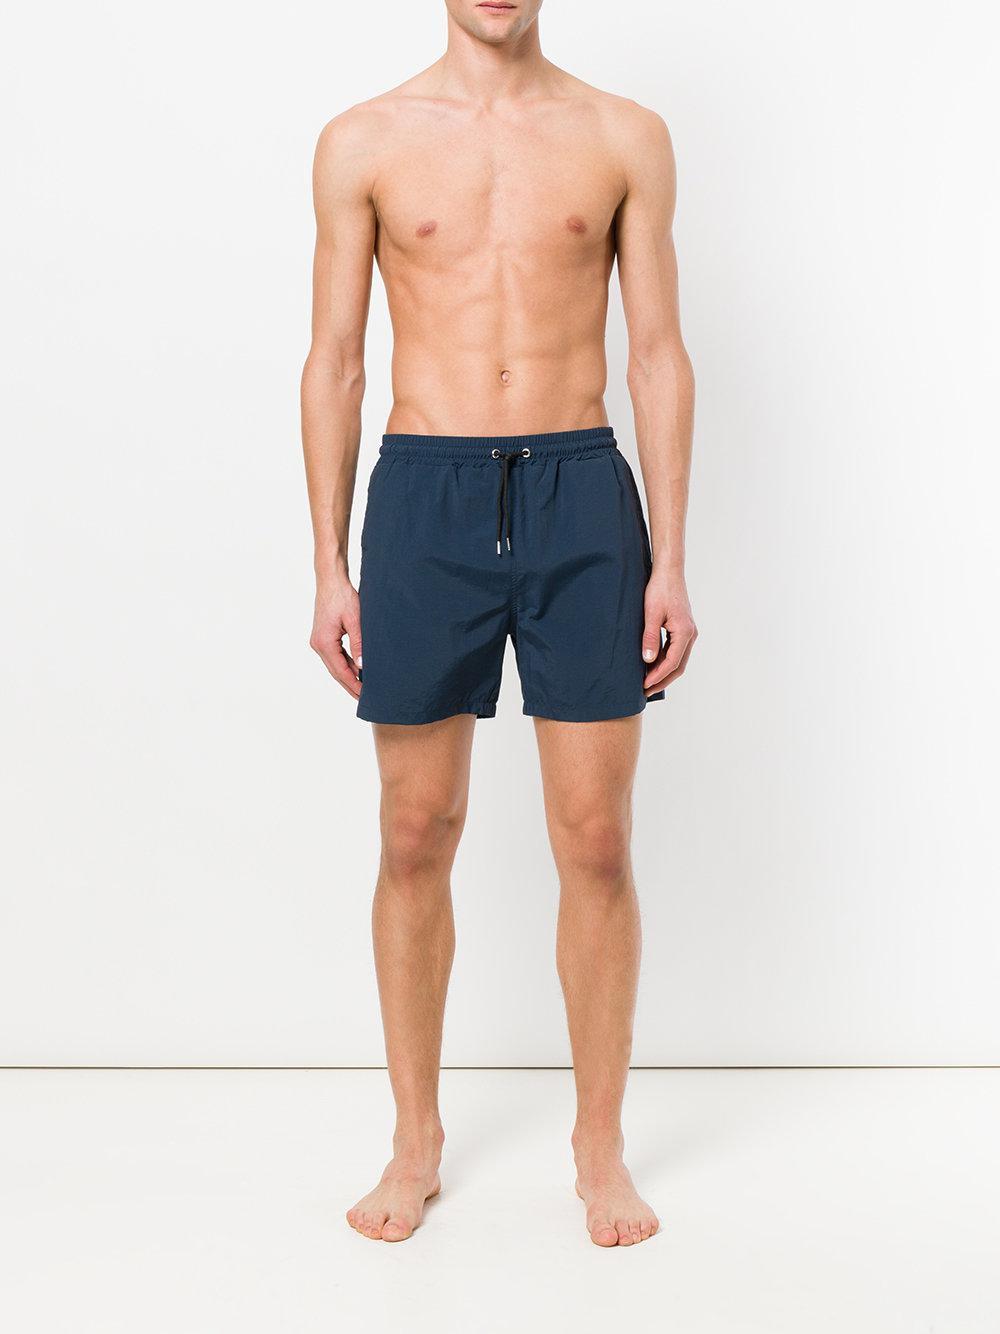 1522a7b848 Lyst - McQ Swallow Bagde Swim Trunks in Blue for Men